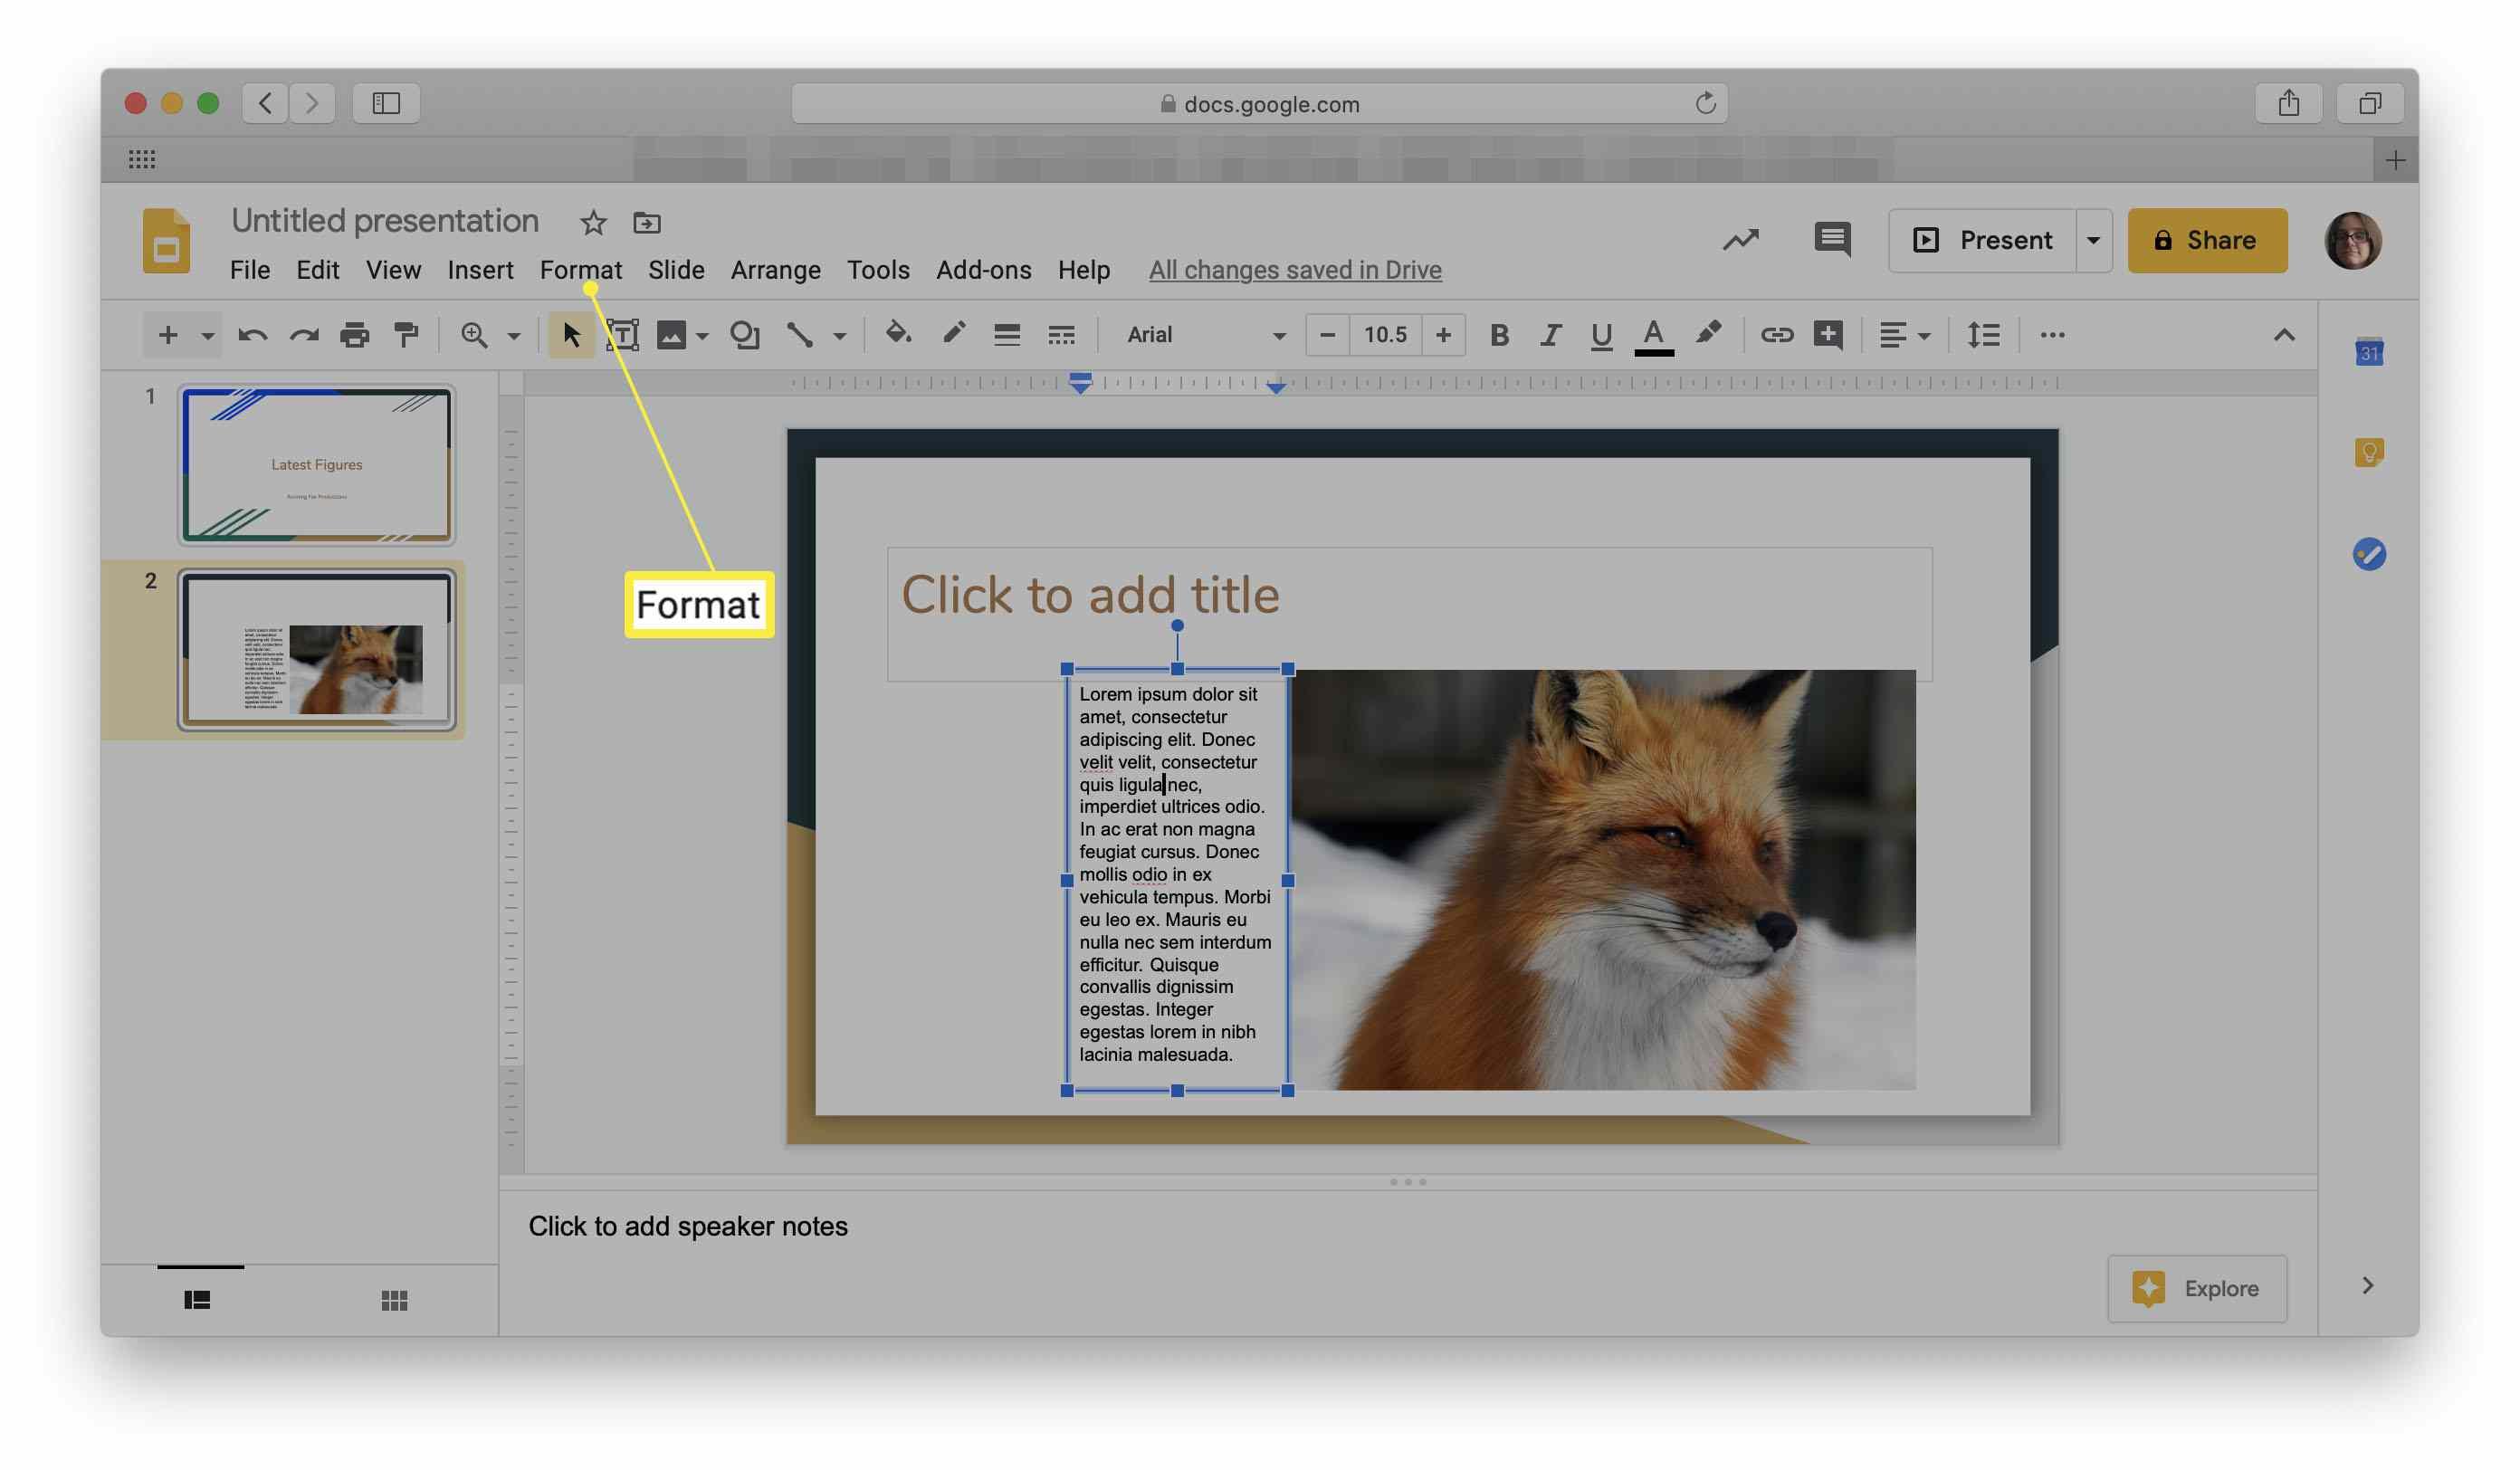 Google Slides with Format menu highlighted